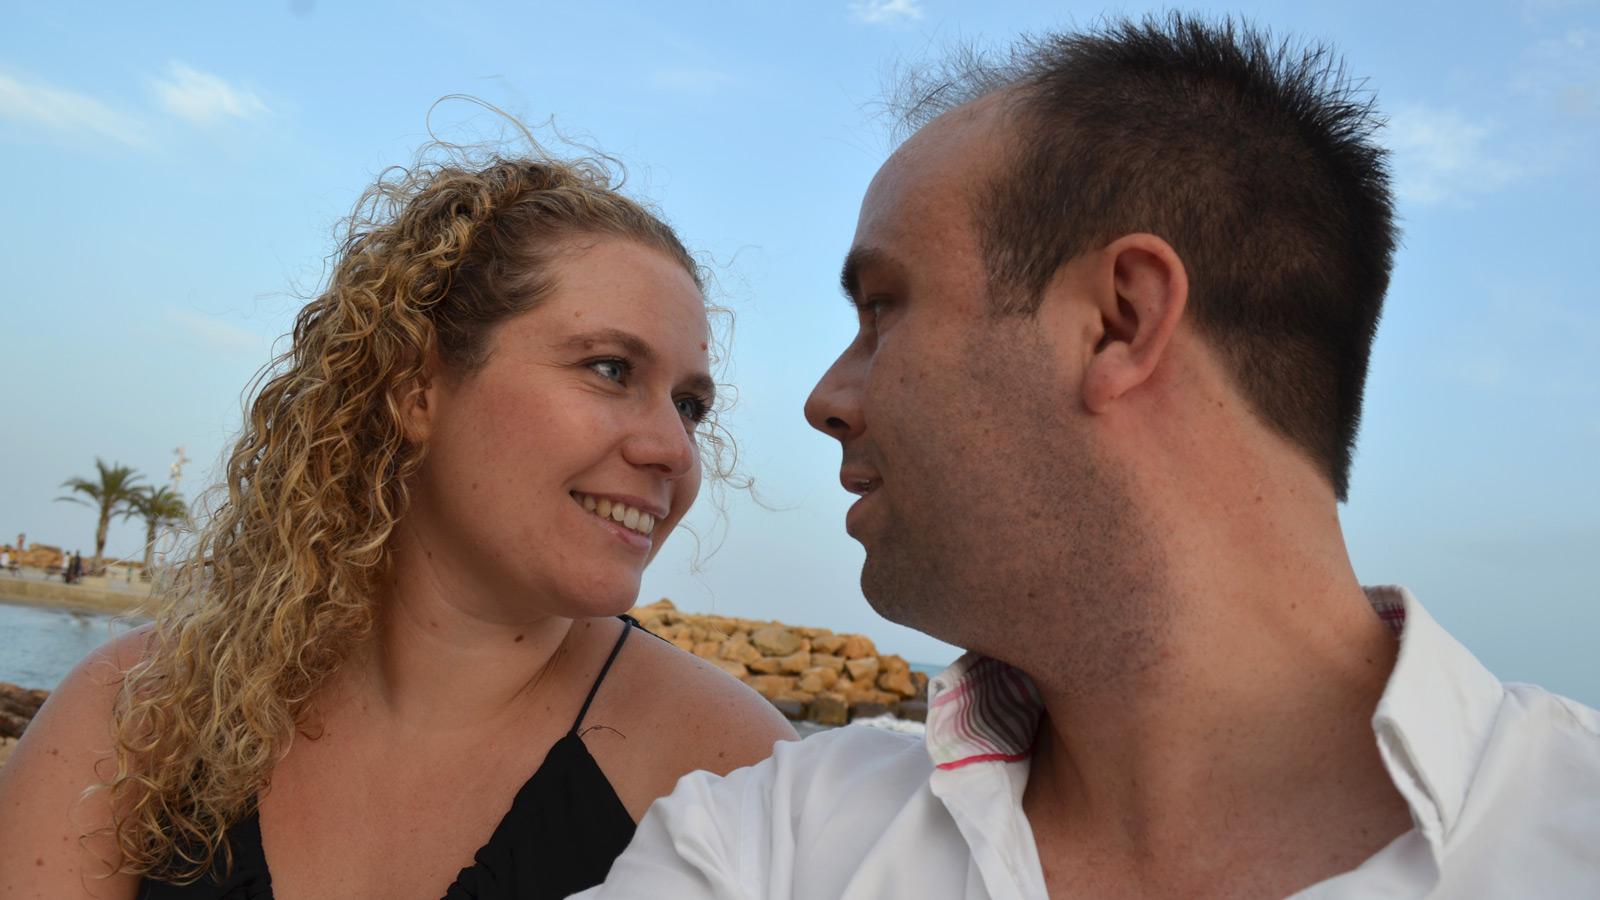 Vida dating cost